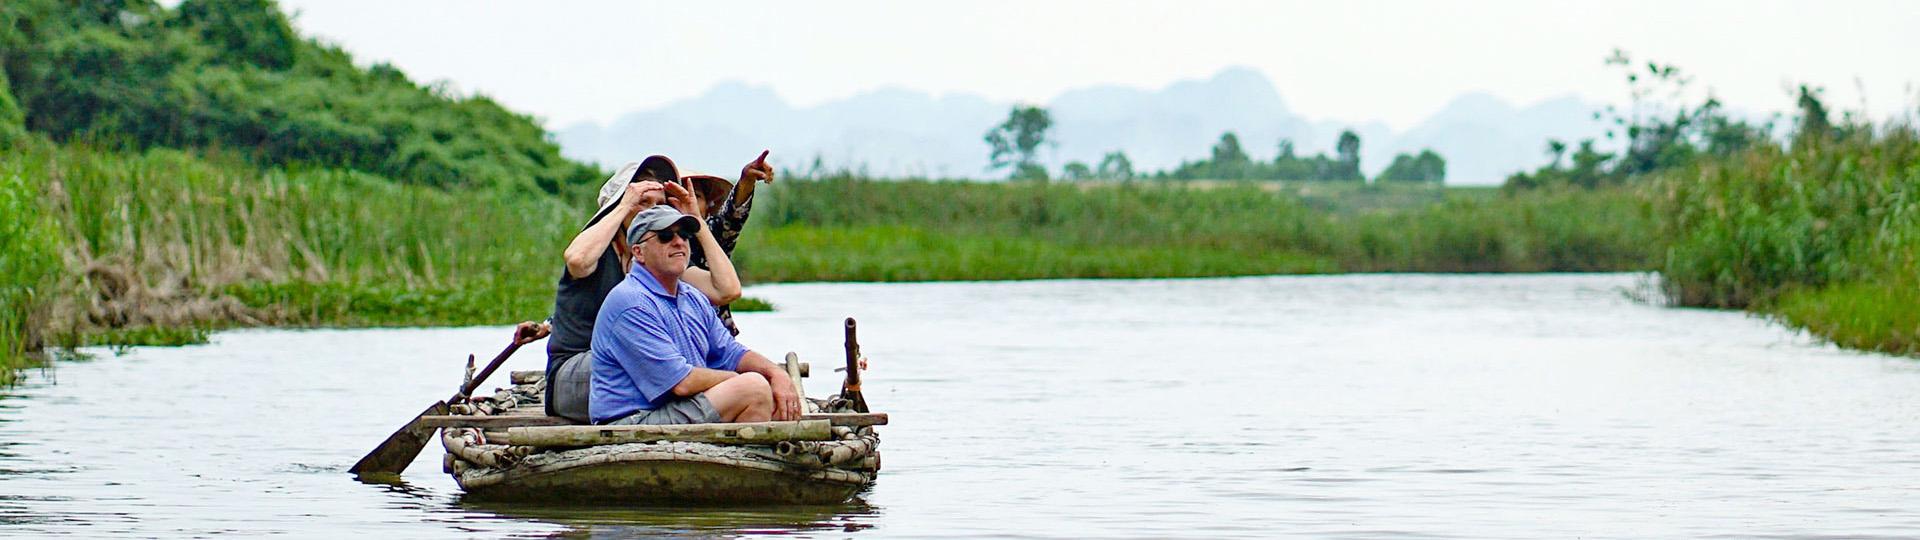 Is it easy to buy a sim card in Vietnam?